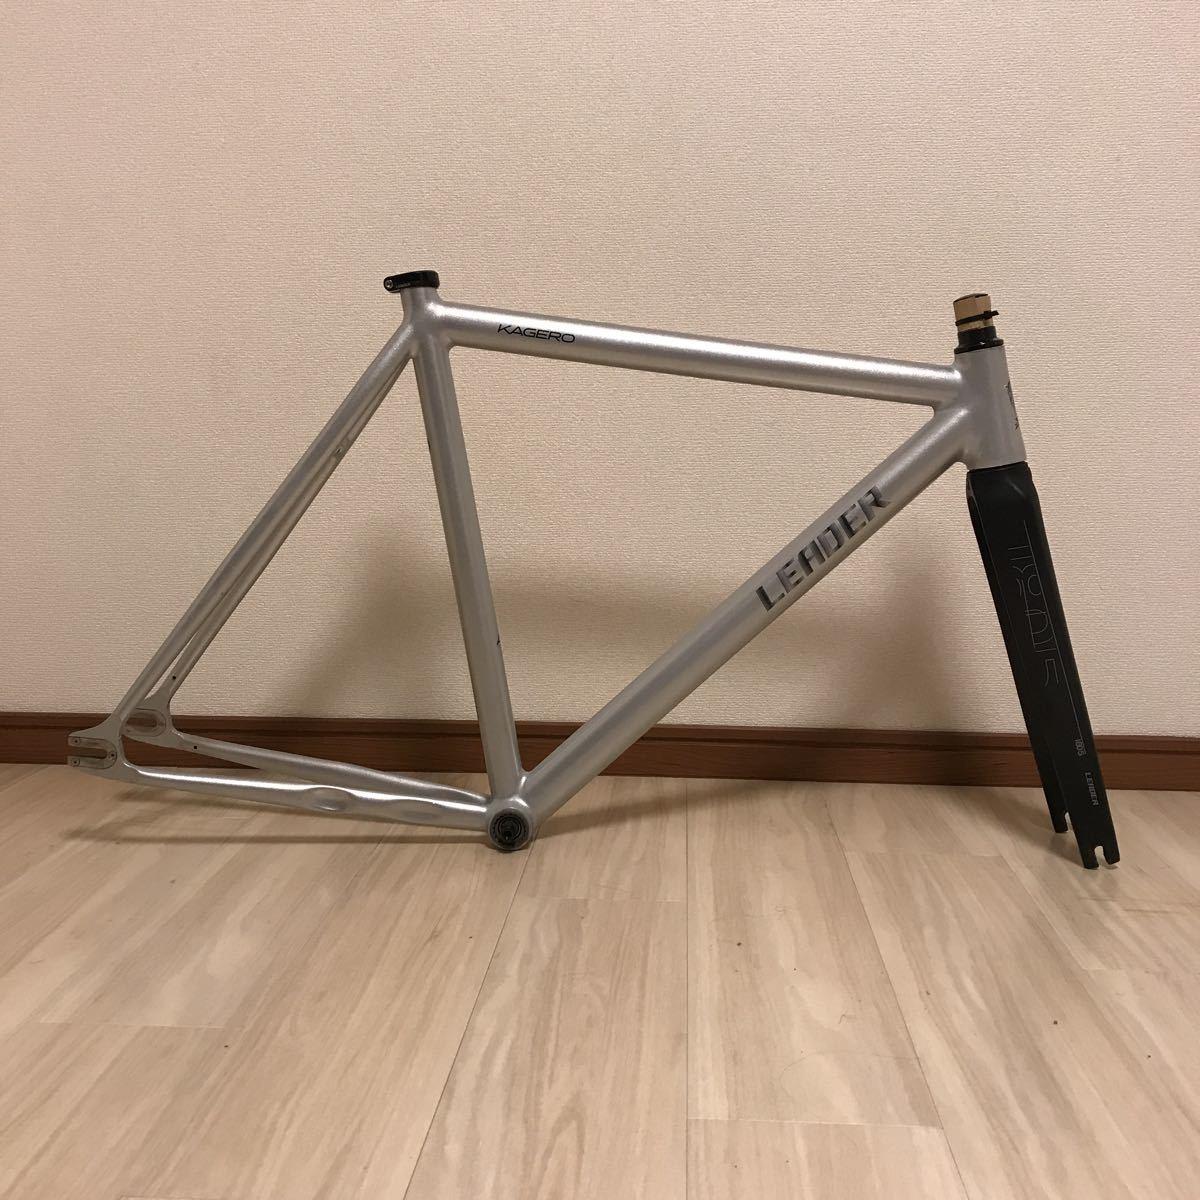 leader bikes kagero リーダーバイク カゲロウ サイズM 極上美品!! ピスト フレーム カーボンフォーク